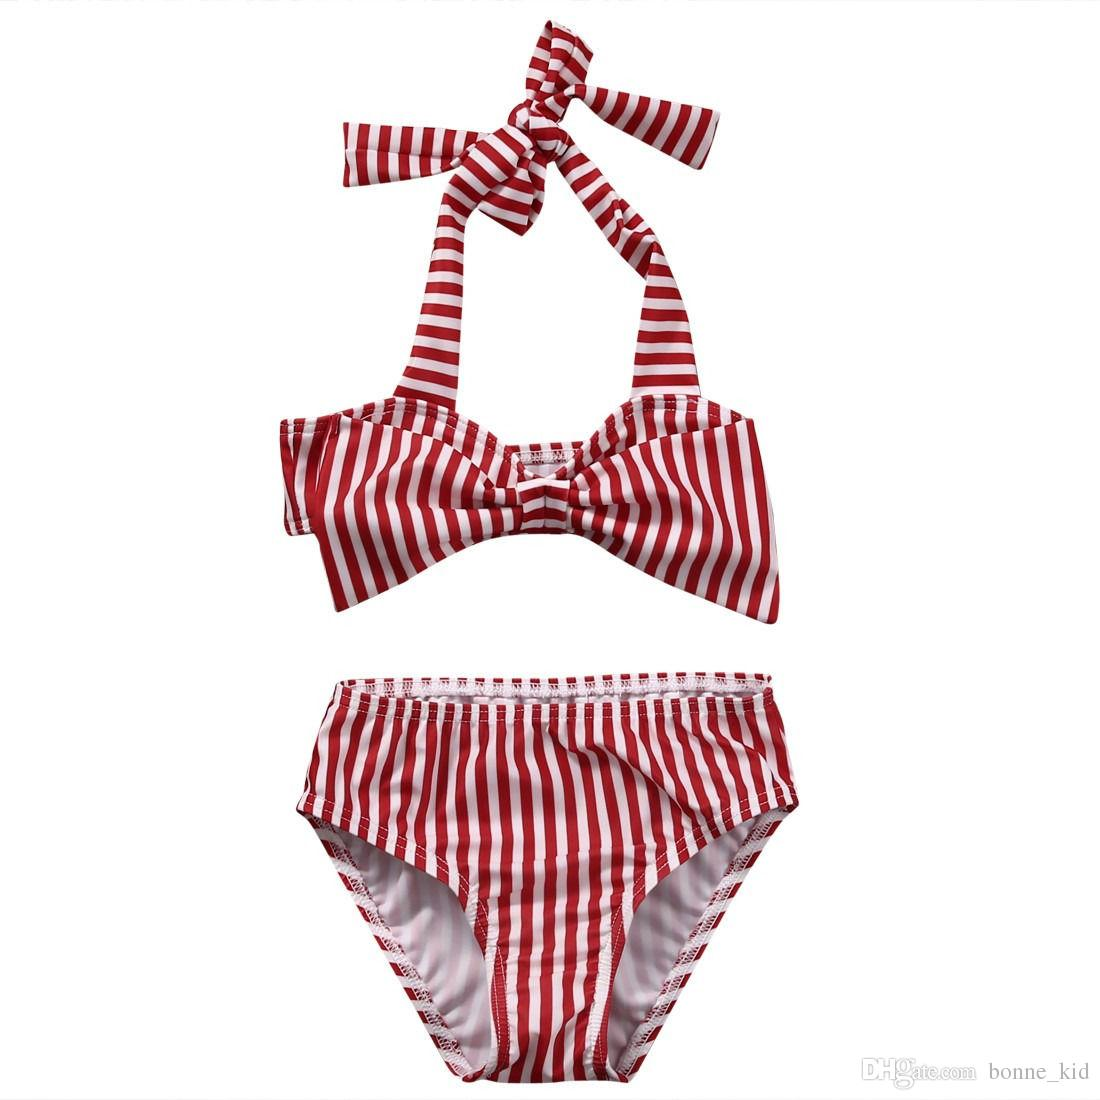 f3c1928ace21c 2019 Baby Girls Red Striped Bowknot Bikini Bandage Swimsuita Kids Wears Swimsuit  Bathing Suit Beach Swimming Pool Wear From Bonne_kid, $7.56 | DHgate.Com